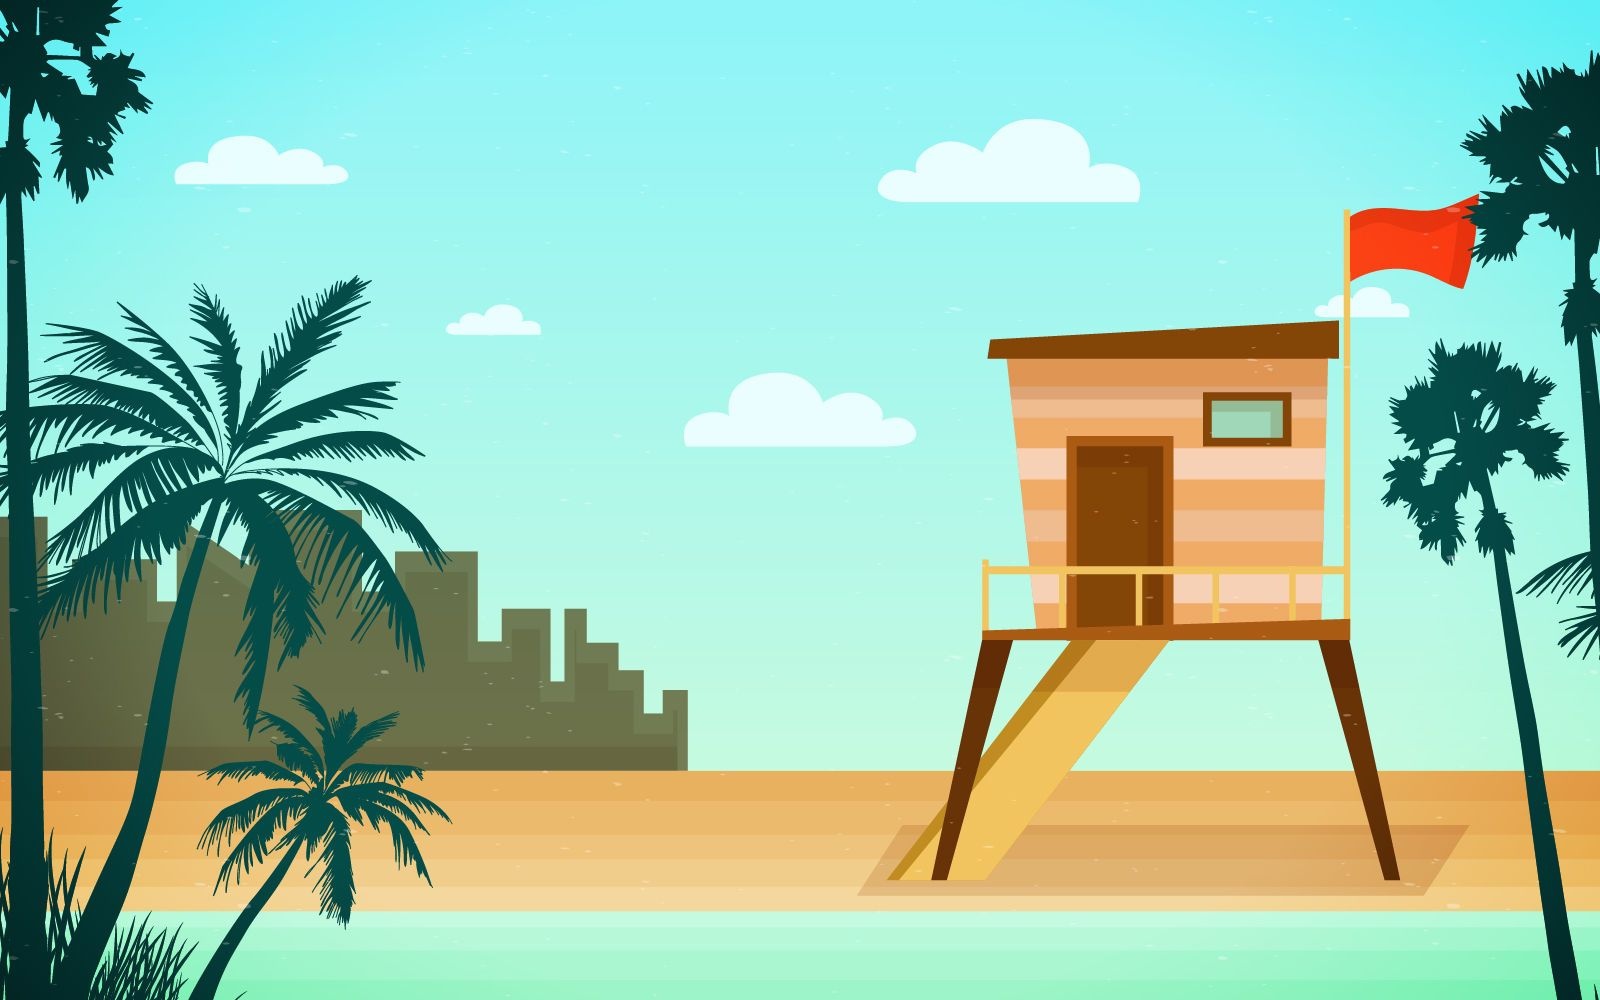 Beach rescue tower skyline illustration